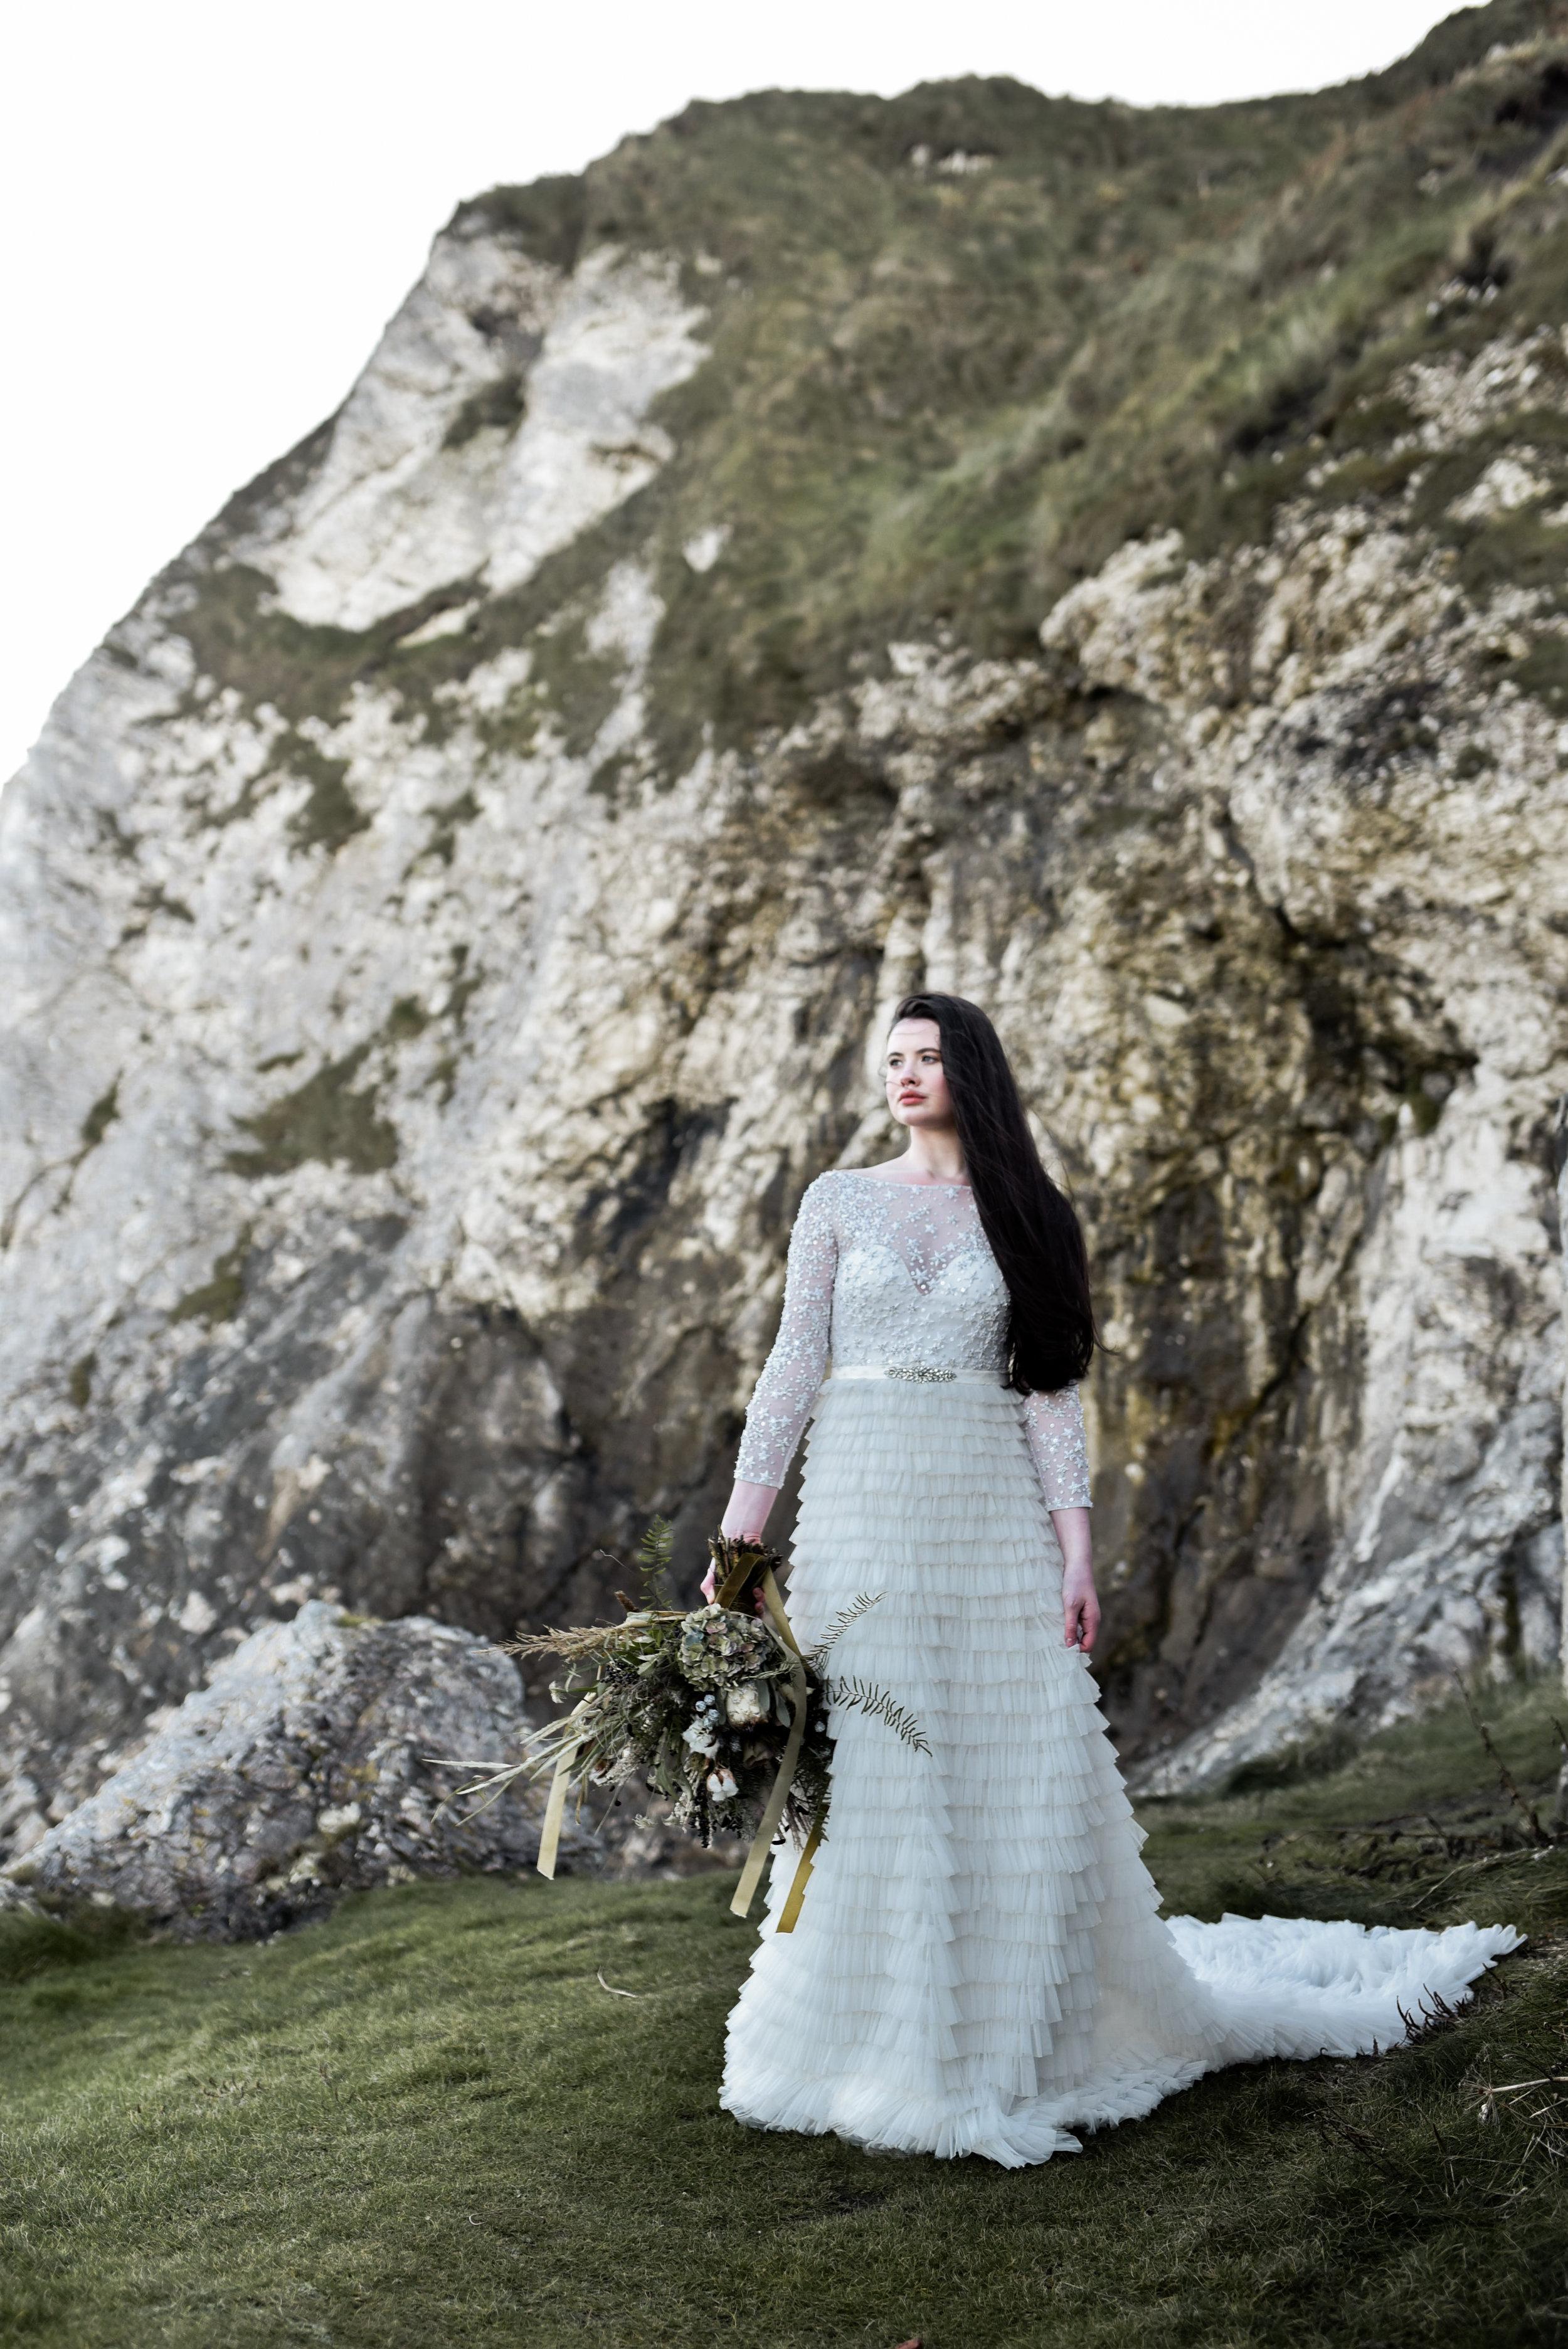 Tara-Florence-Ireland'18-1a.jpg